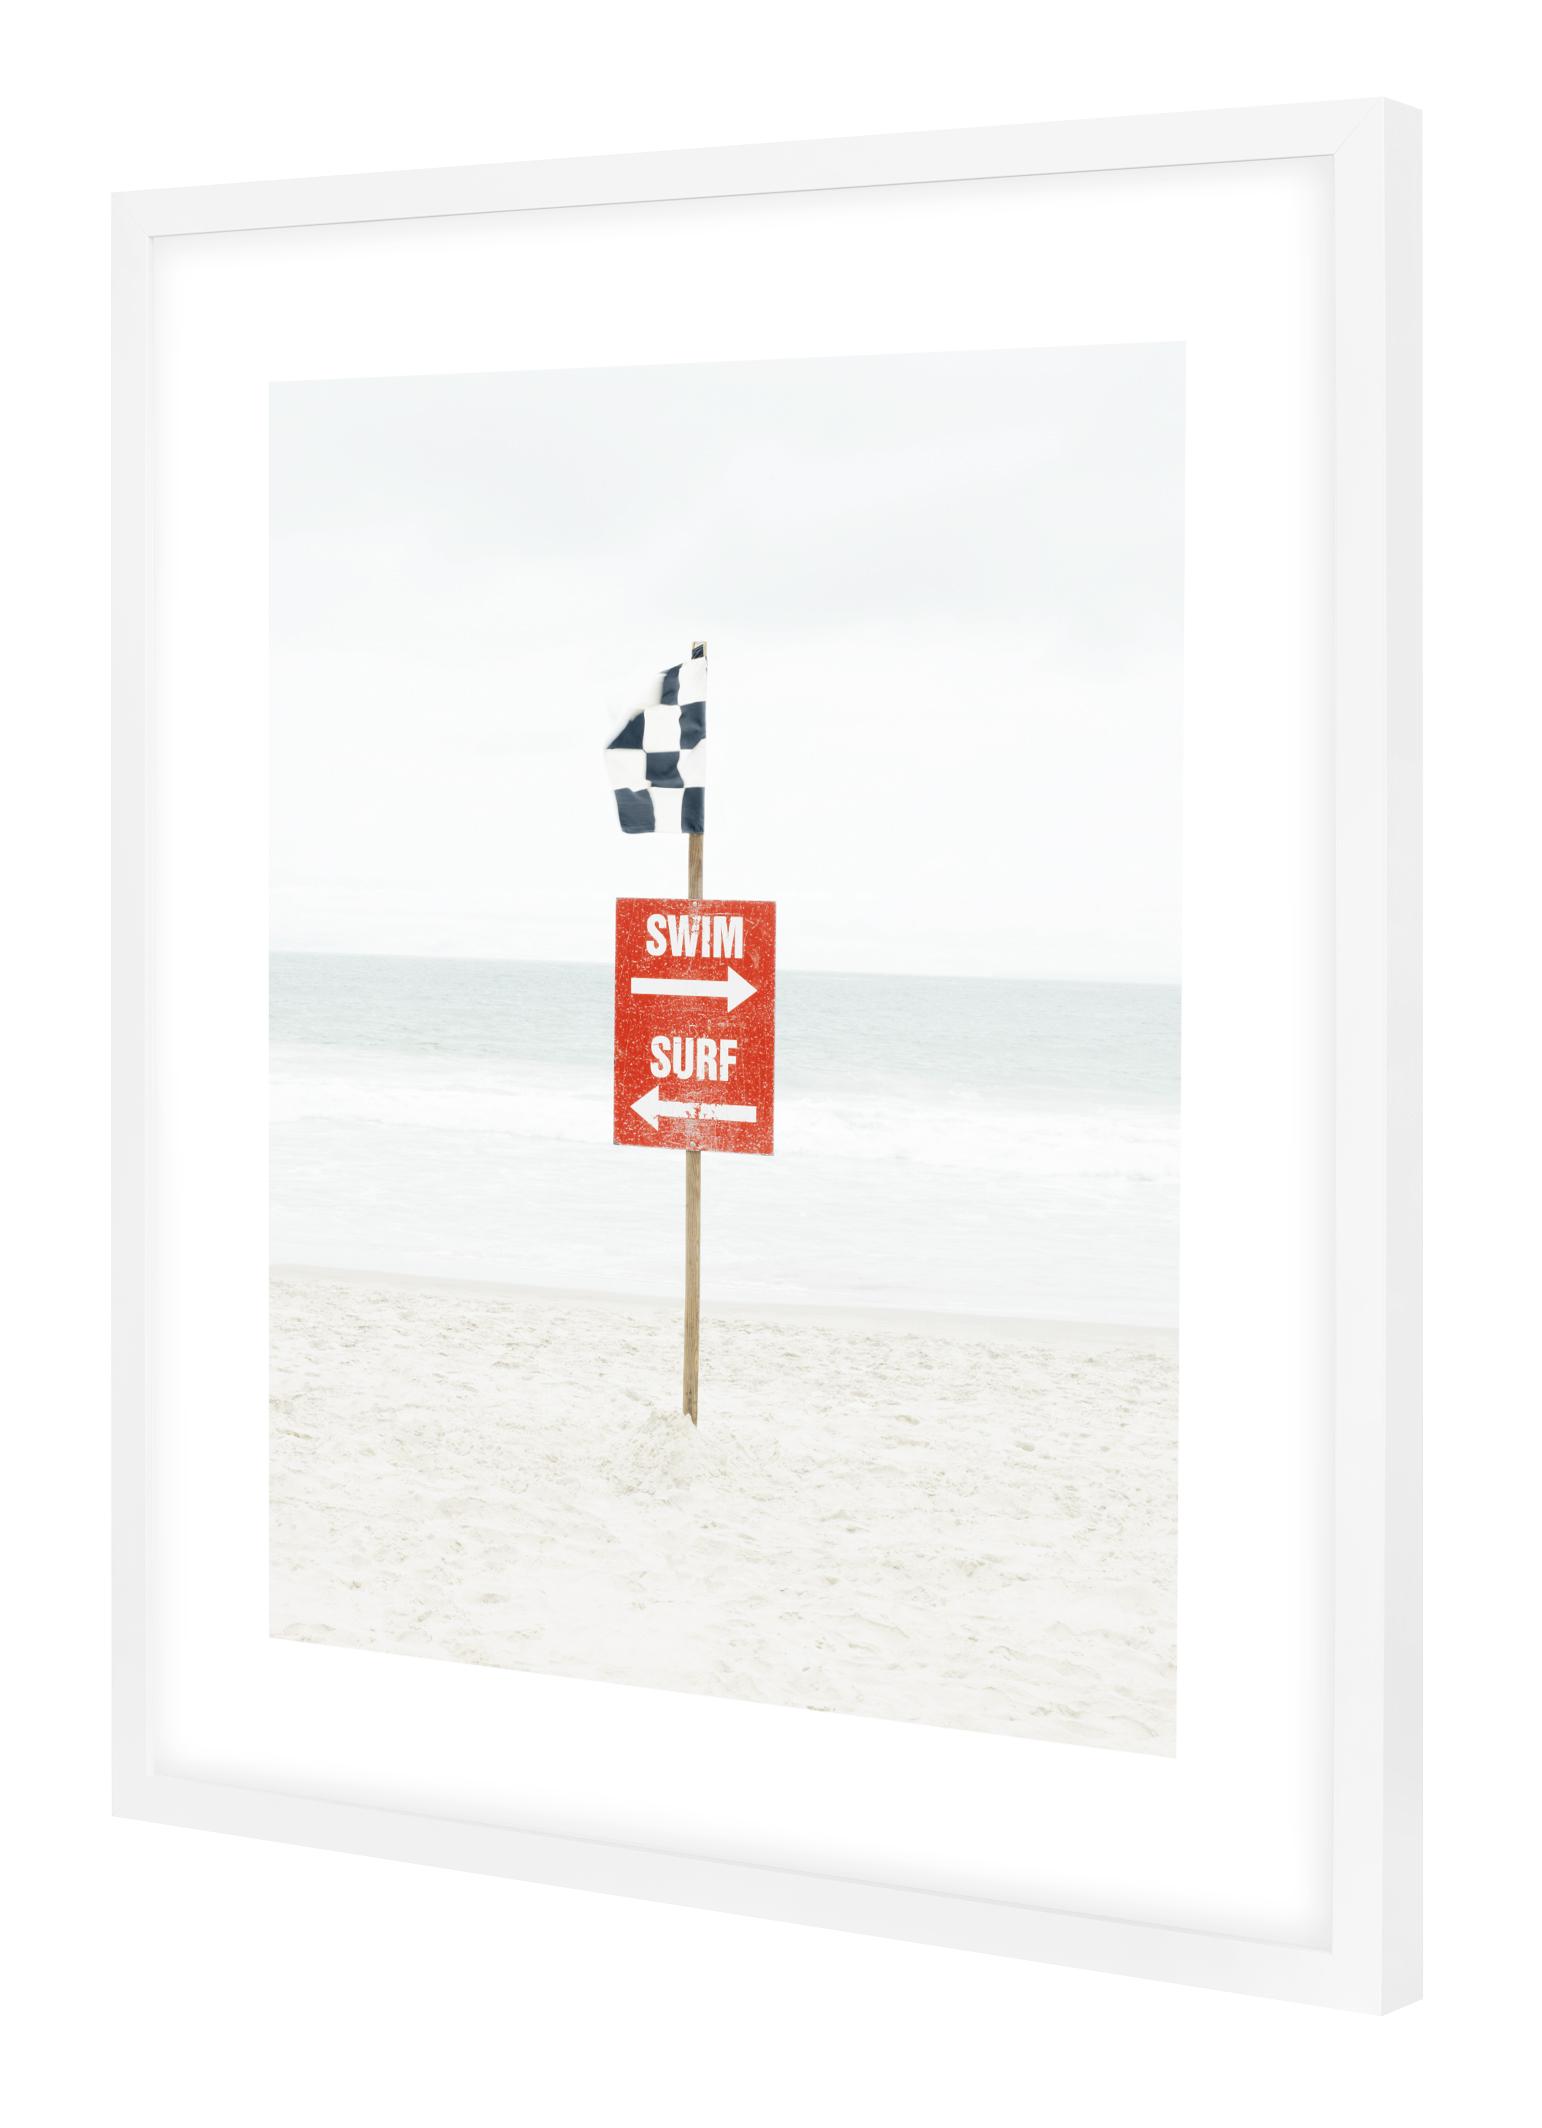 JP GREENWOOD_SWIM SURF.jpg